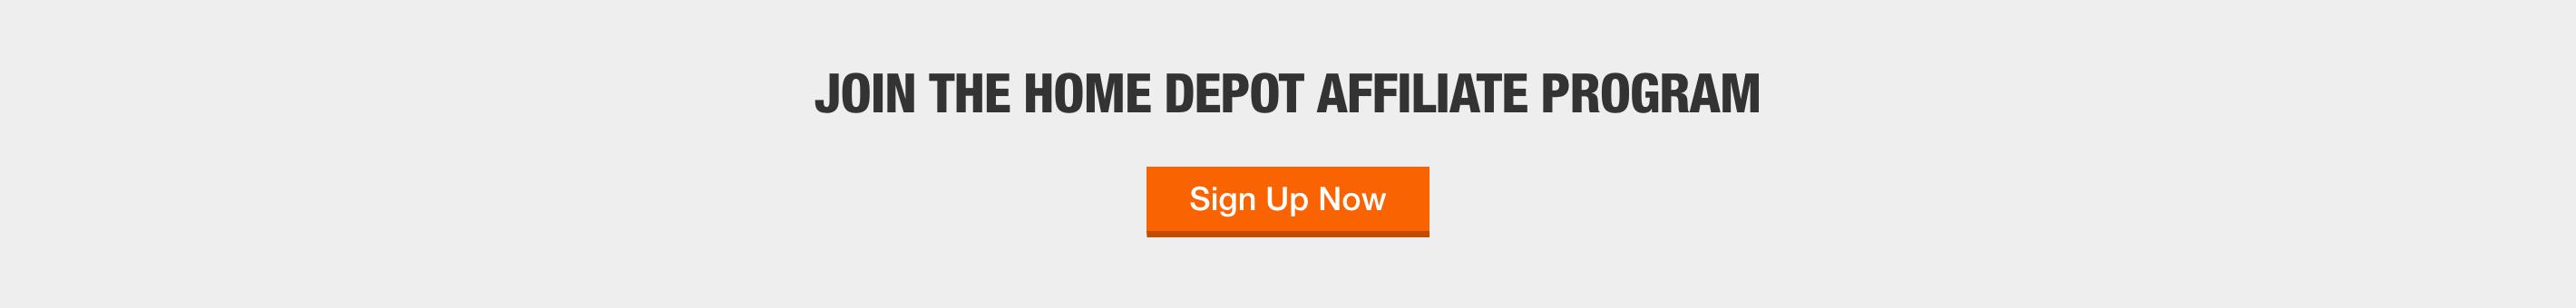 The Home Depot Affiliate Program